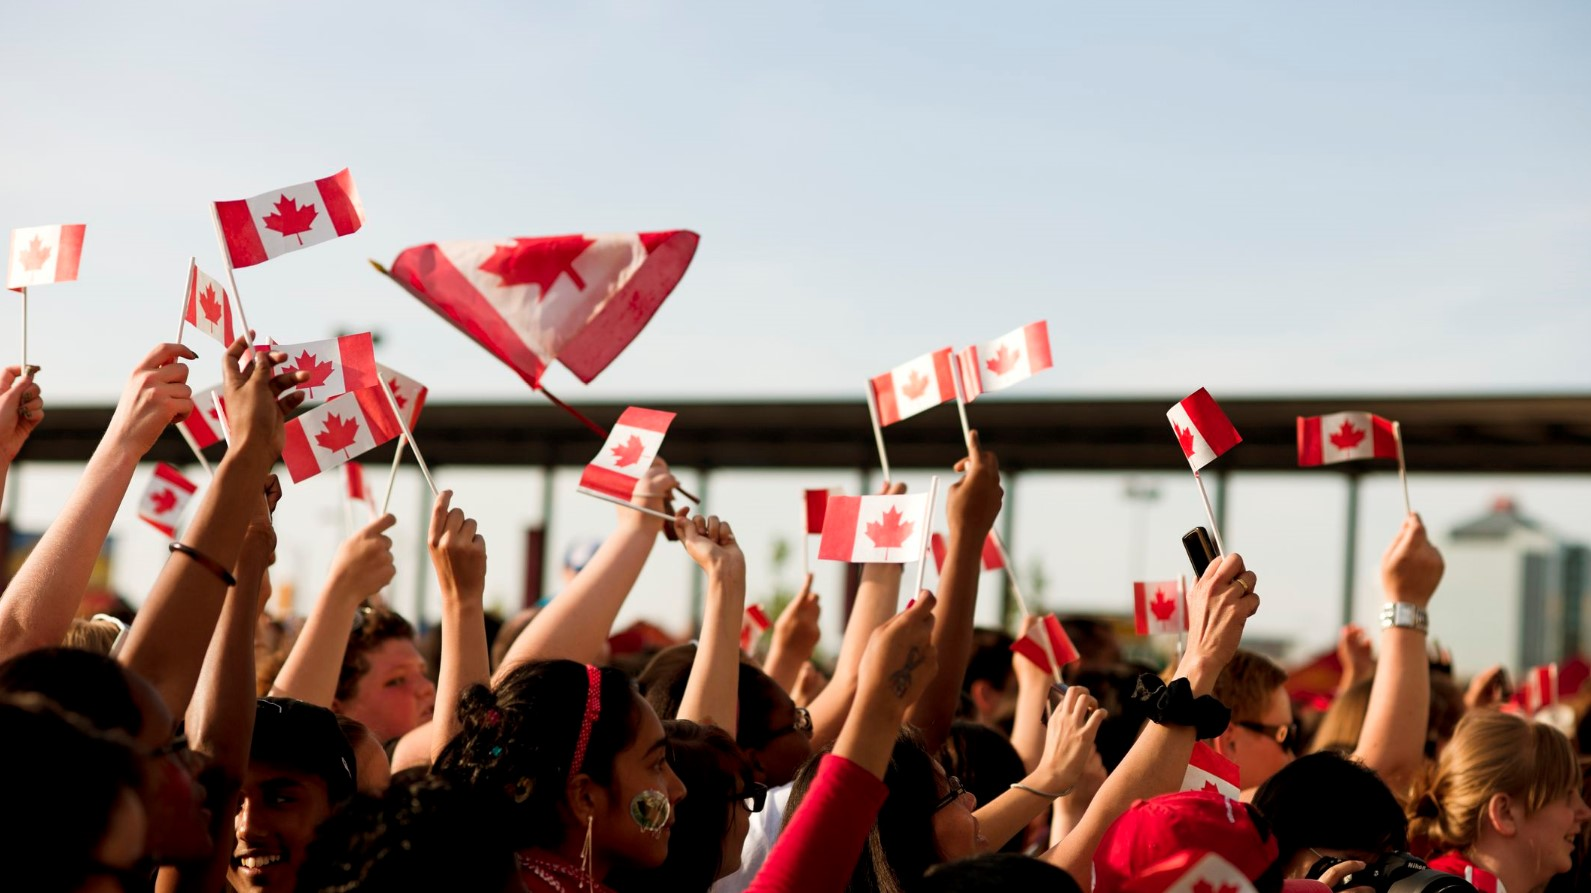 2021 Statutory Holidays in Canada